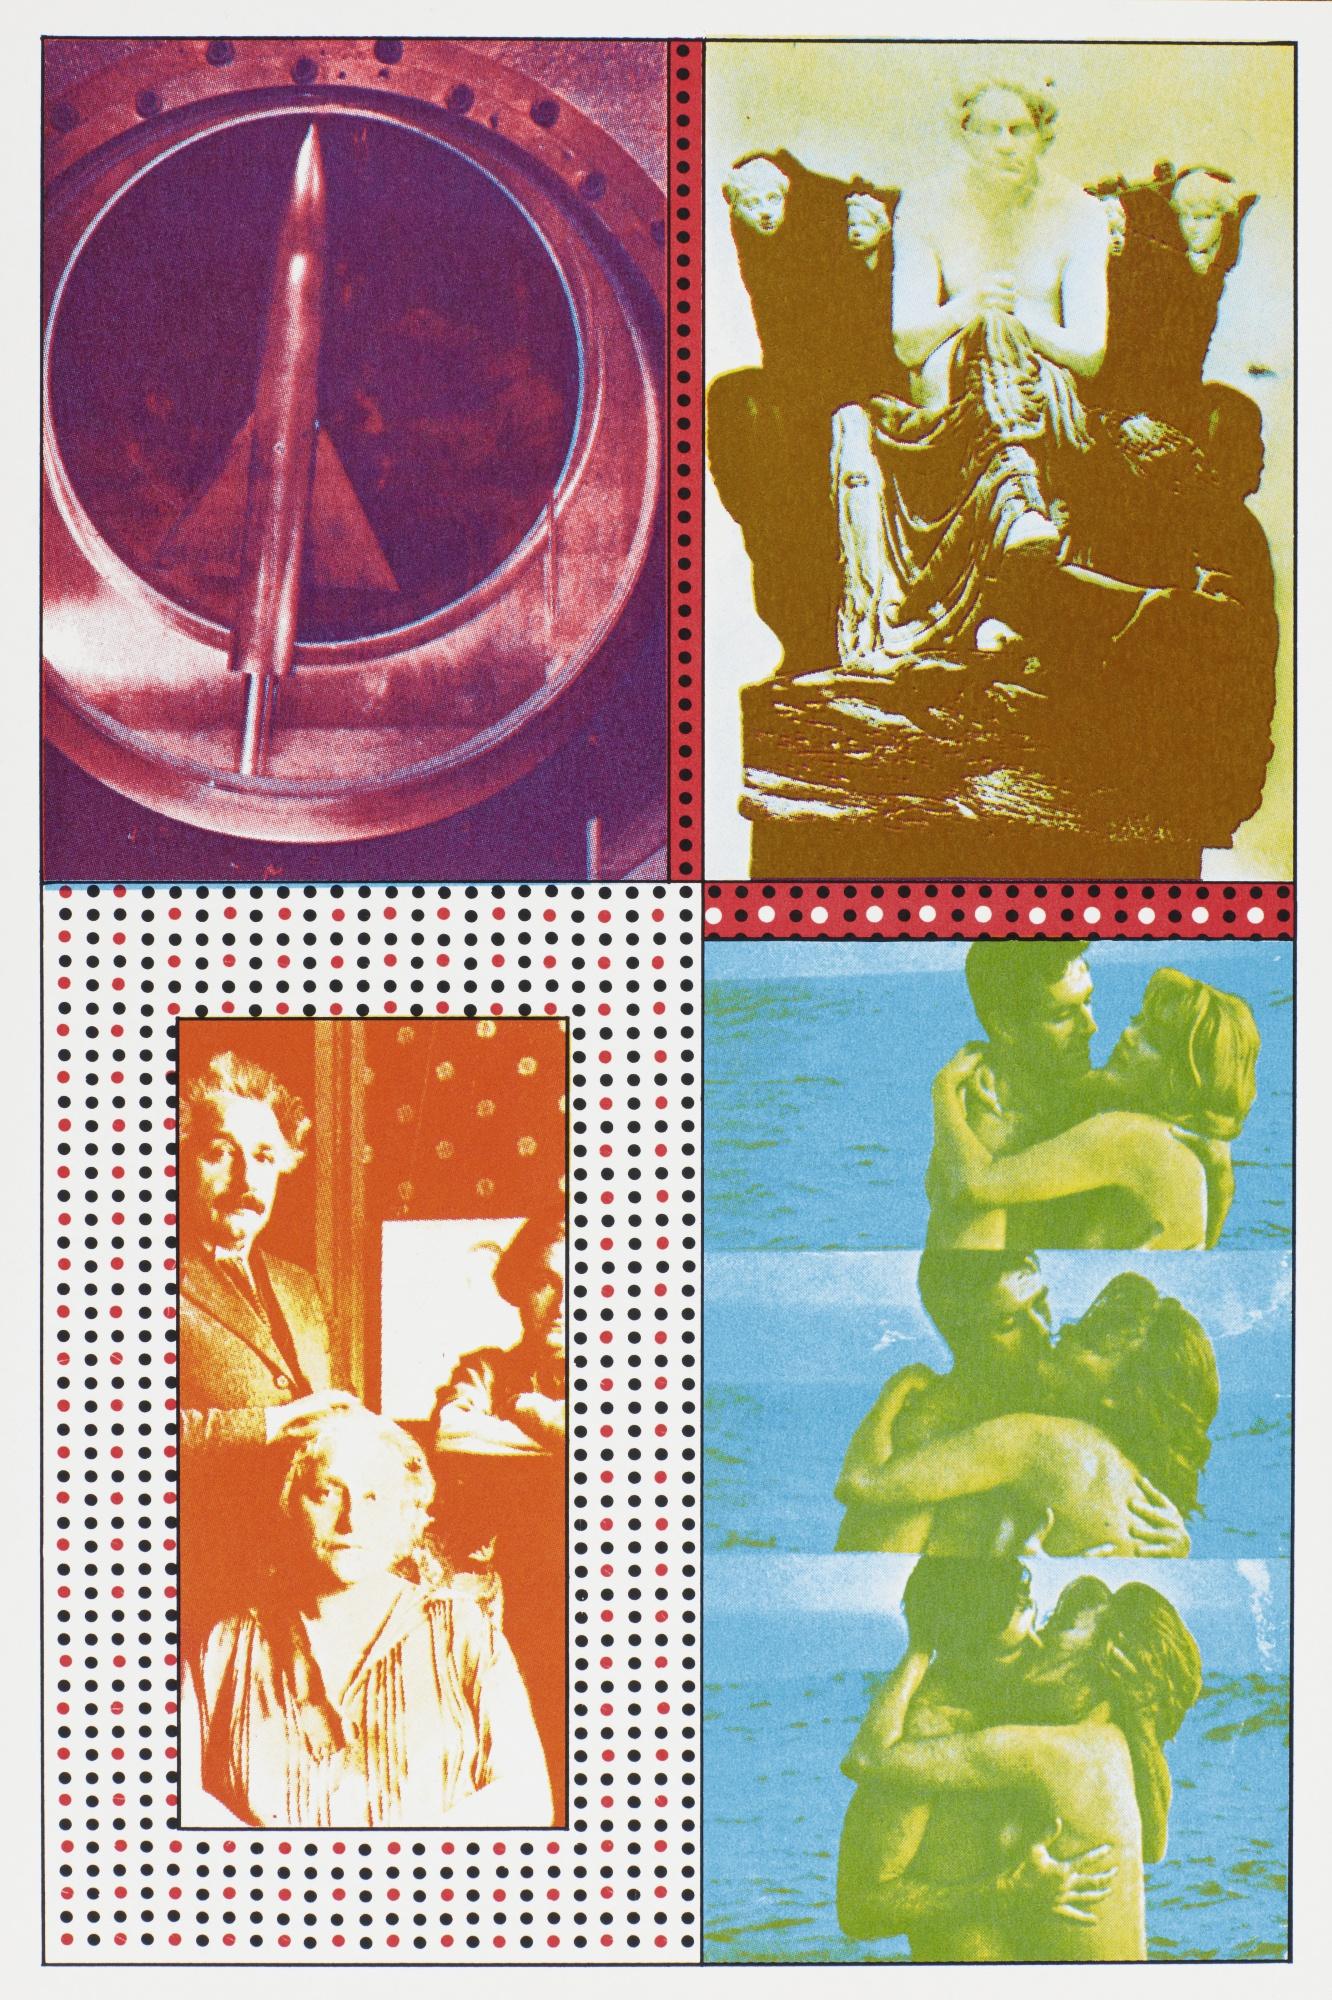 Eduardo Paolozzi-Moonstrips Empire News Volume I; General Dynamic F.U.N.; And Bunk! (V&A; 37, 54, 101-147)-1967